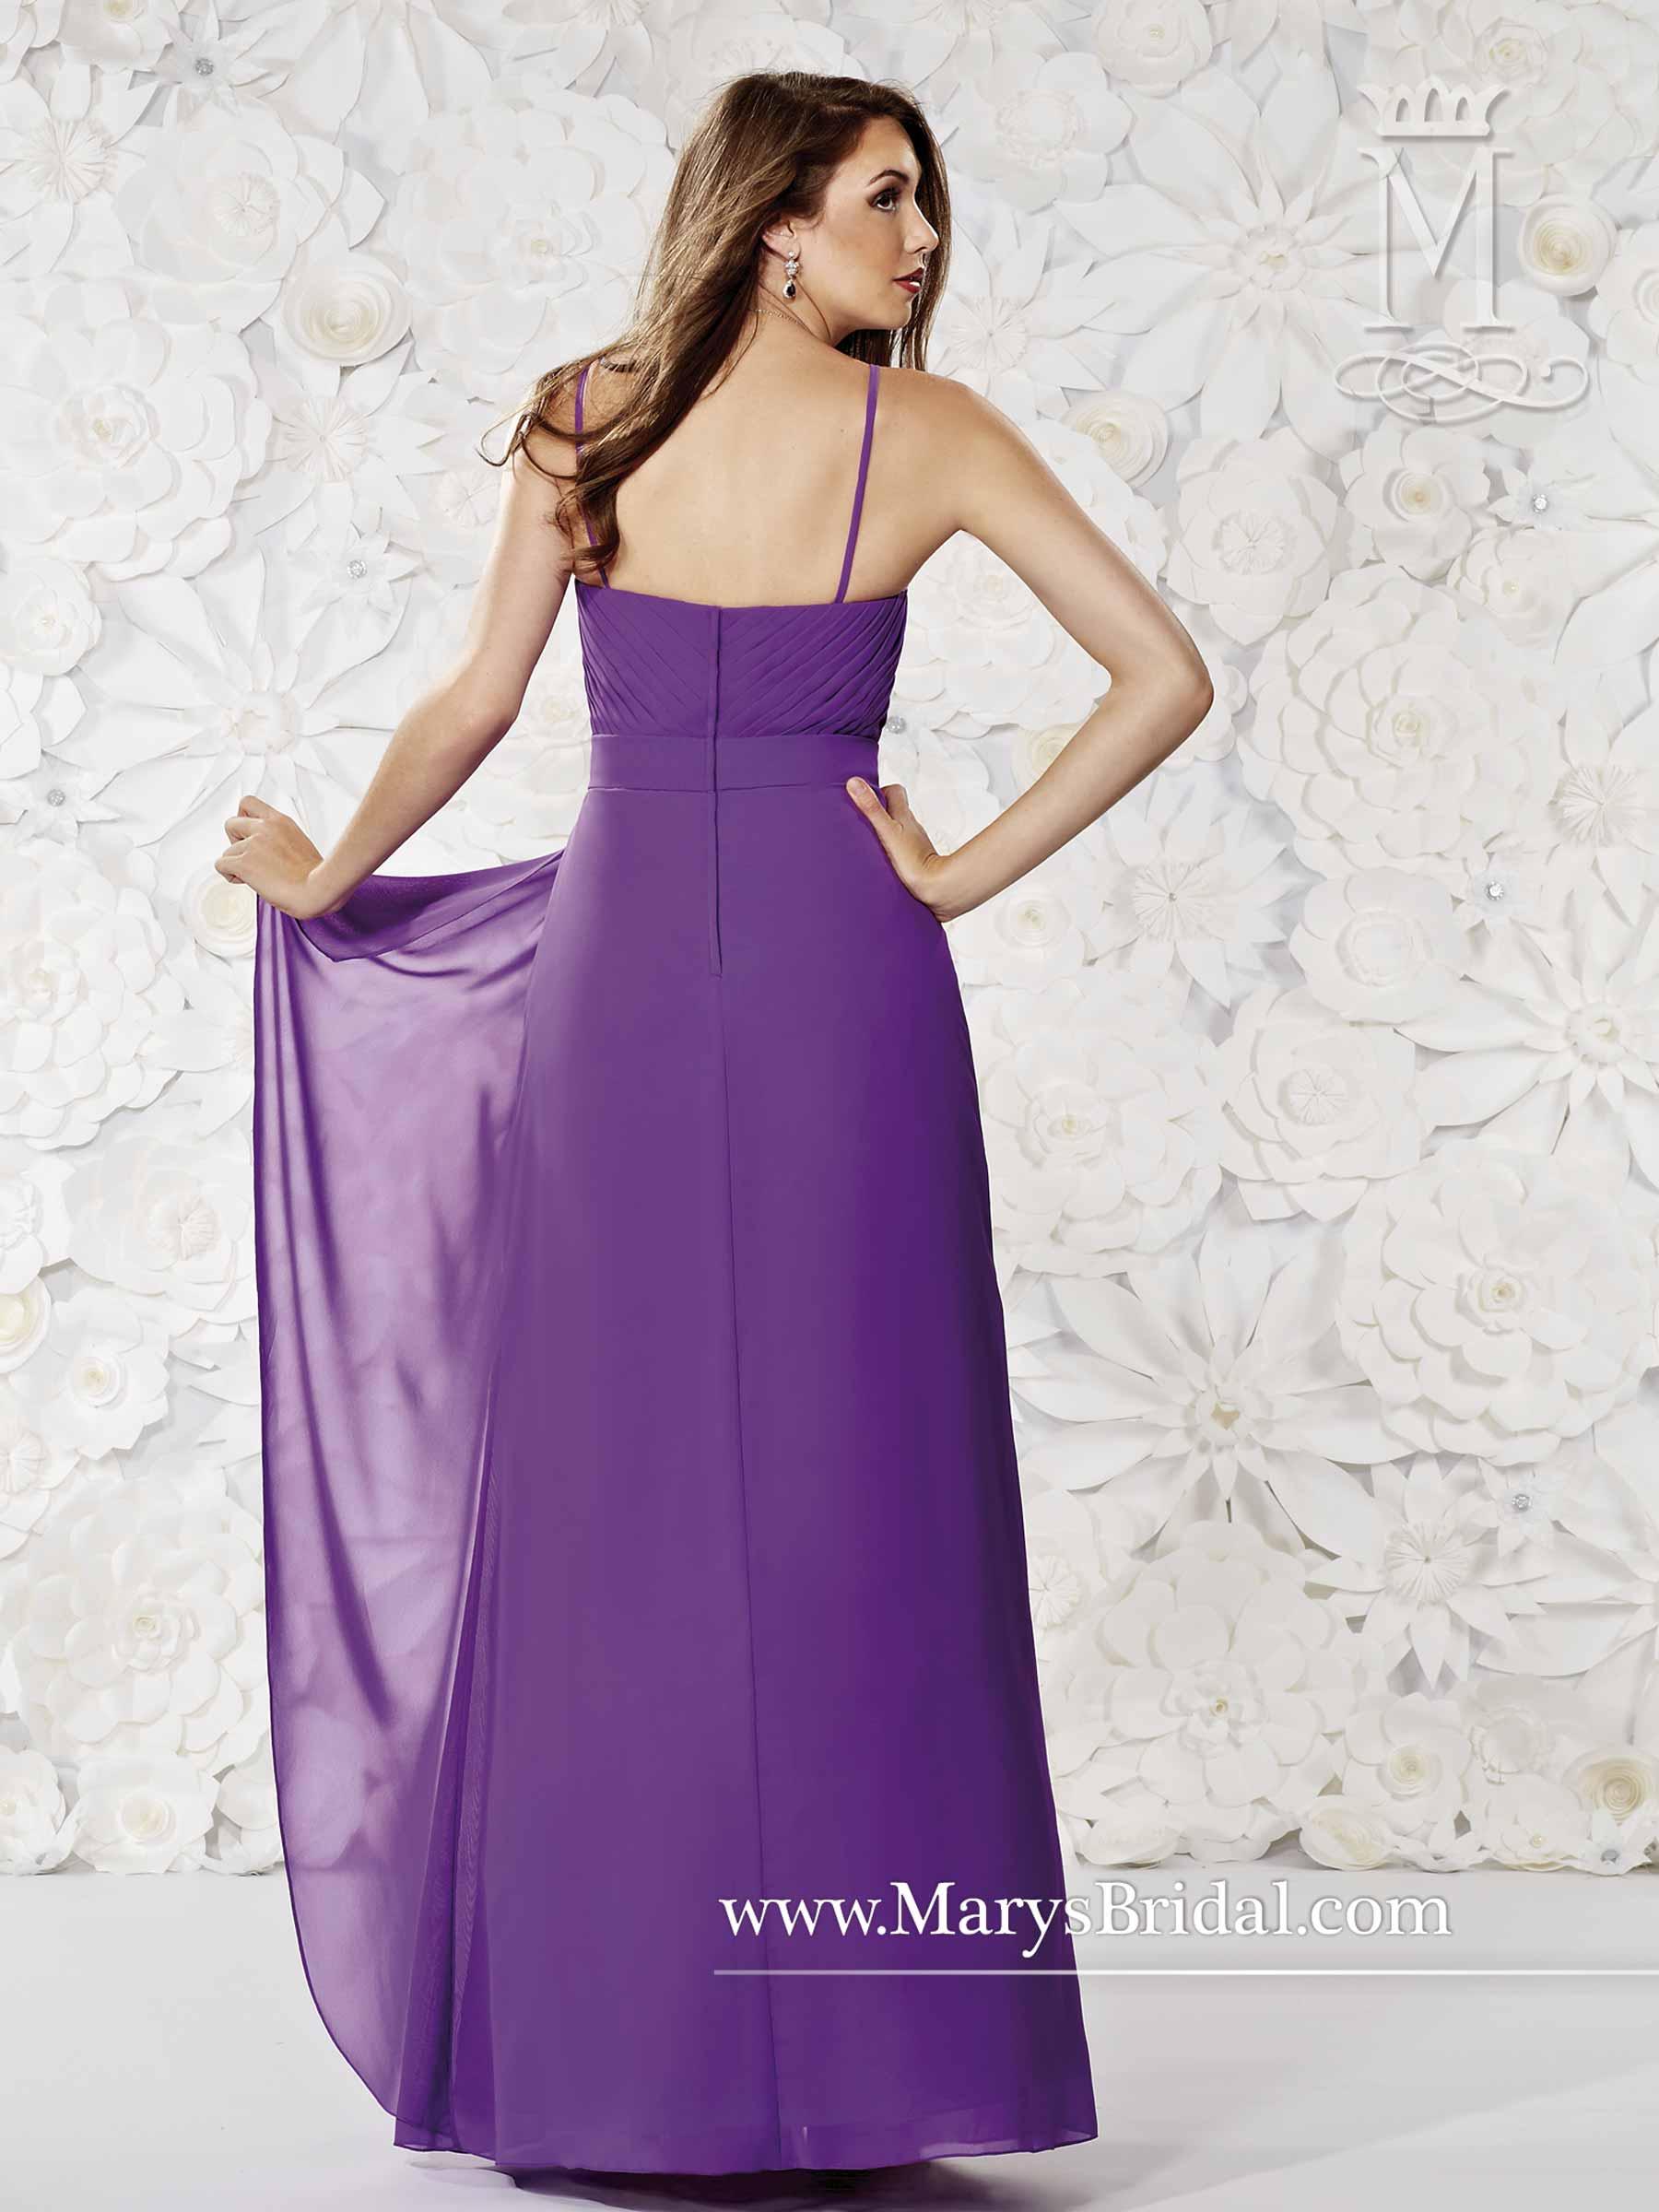 Amalia Bridesmaid Dresses   Style - M1800 in Shown in Regal Color